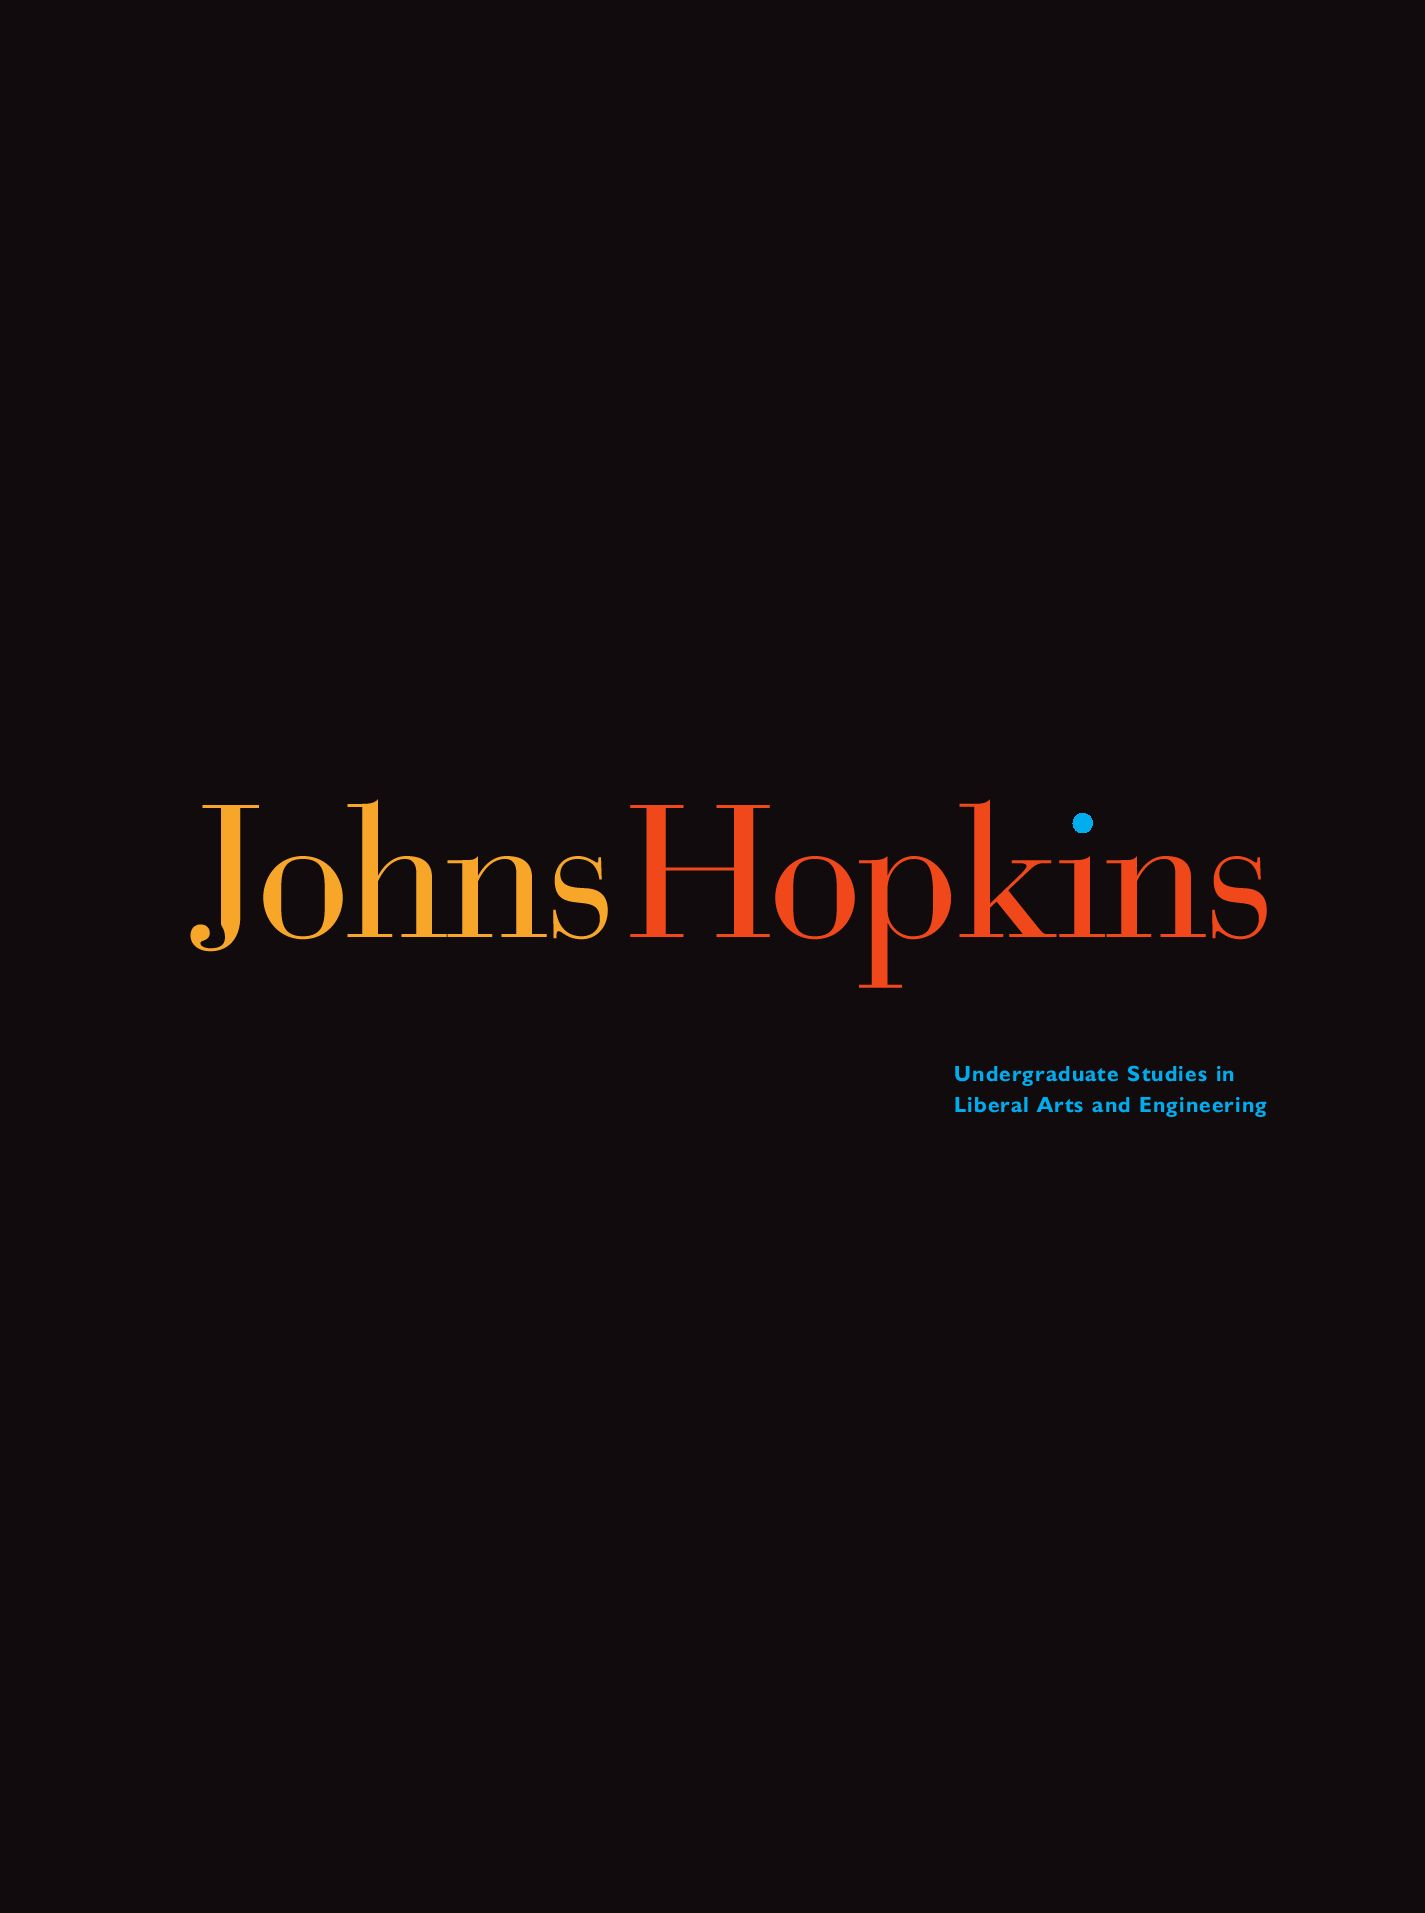 Johns Hopkins University 2008 Viewbook By Glenn Simmons Issuu